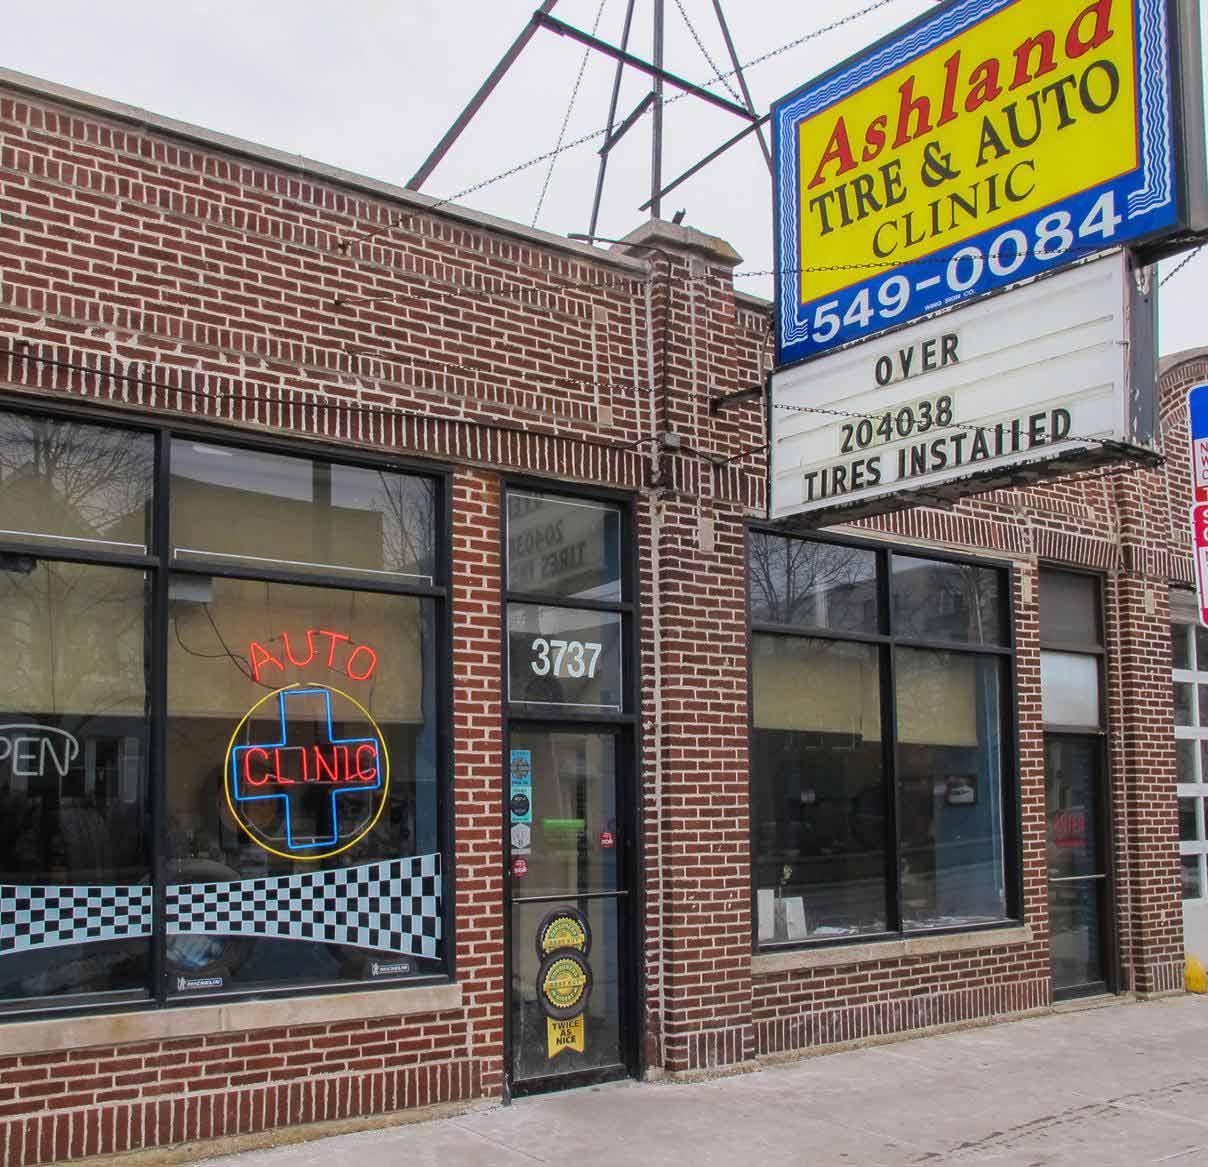 Auto Repair Shop Chicago Tire Repair Shop Ashland Tire Auto